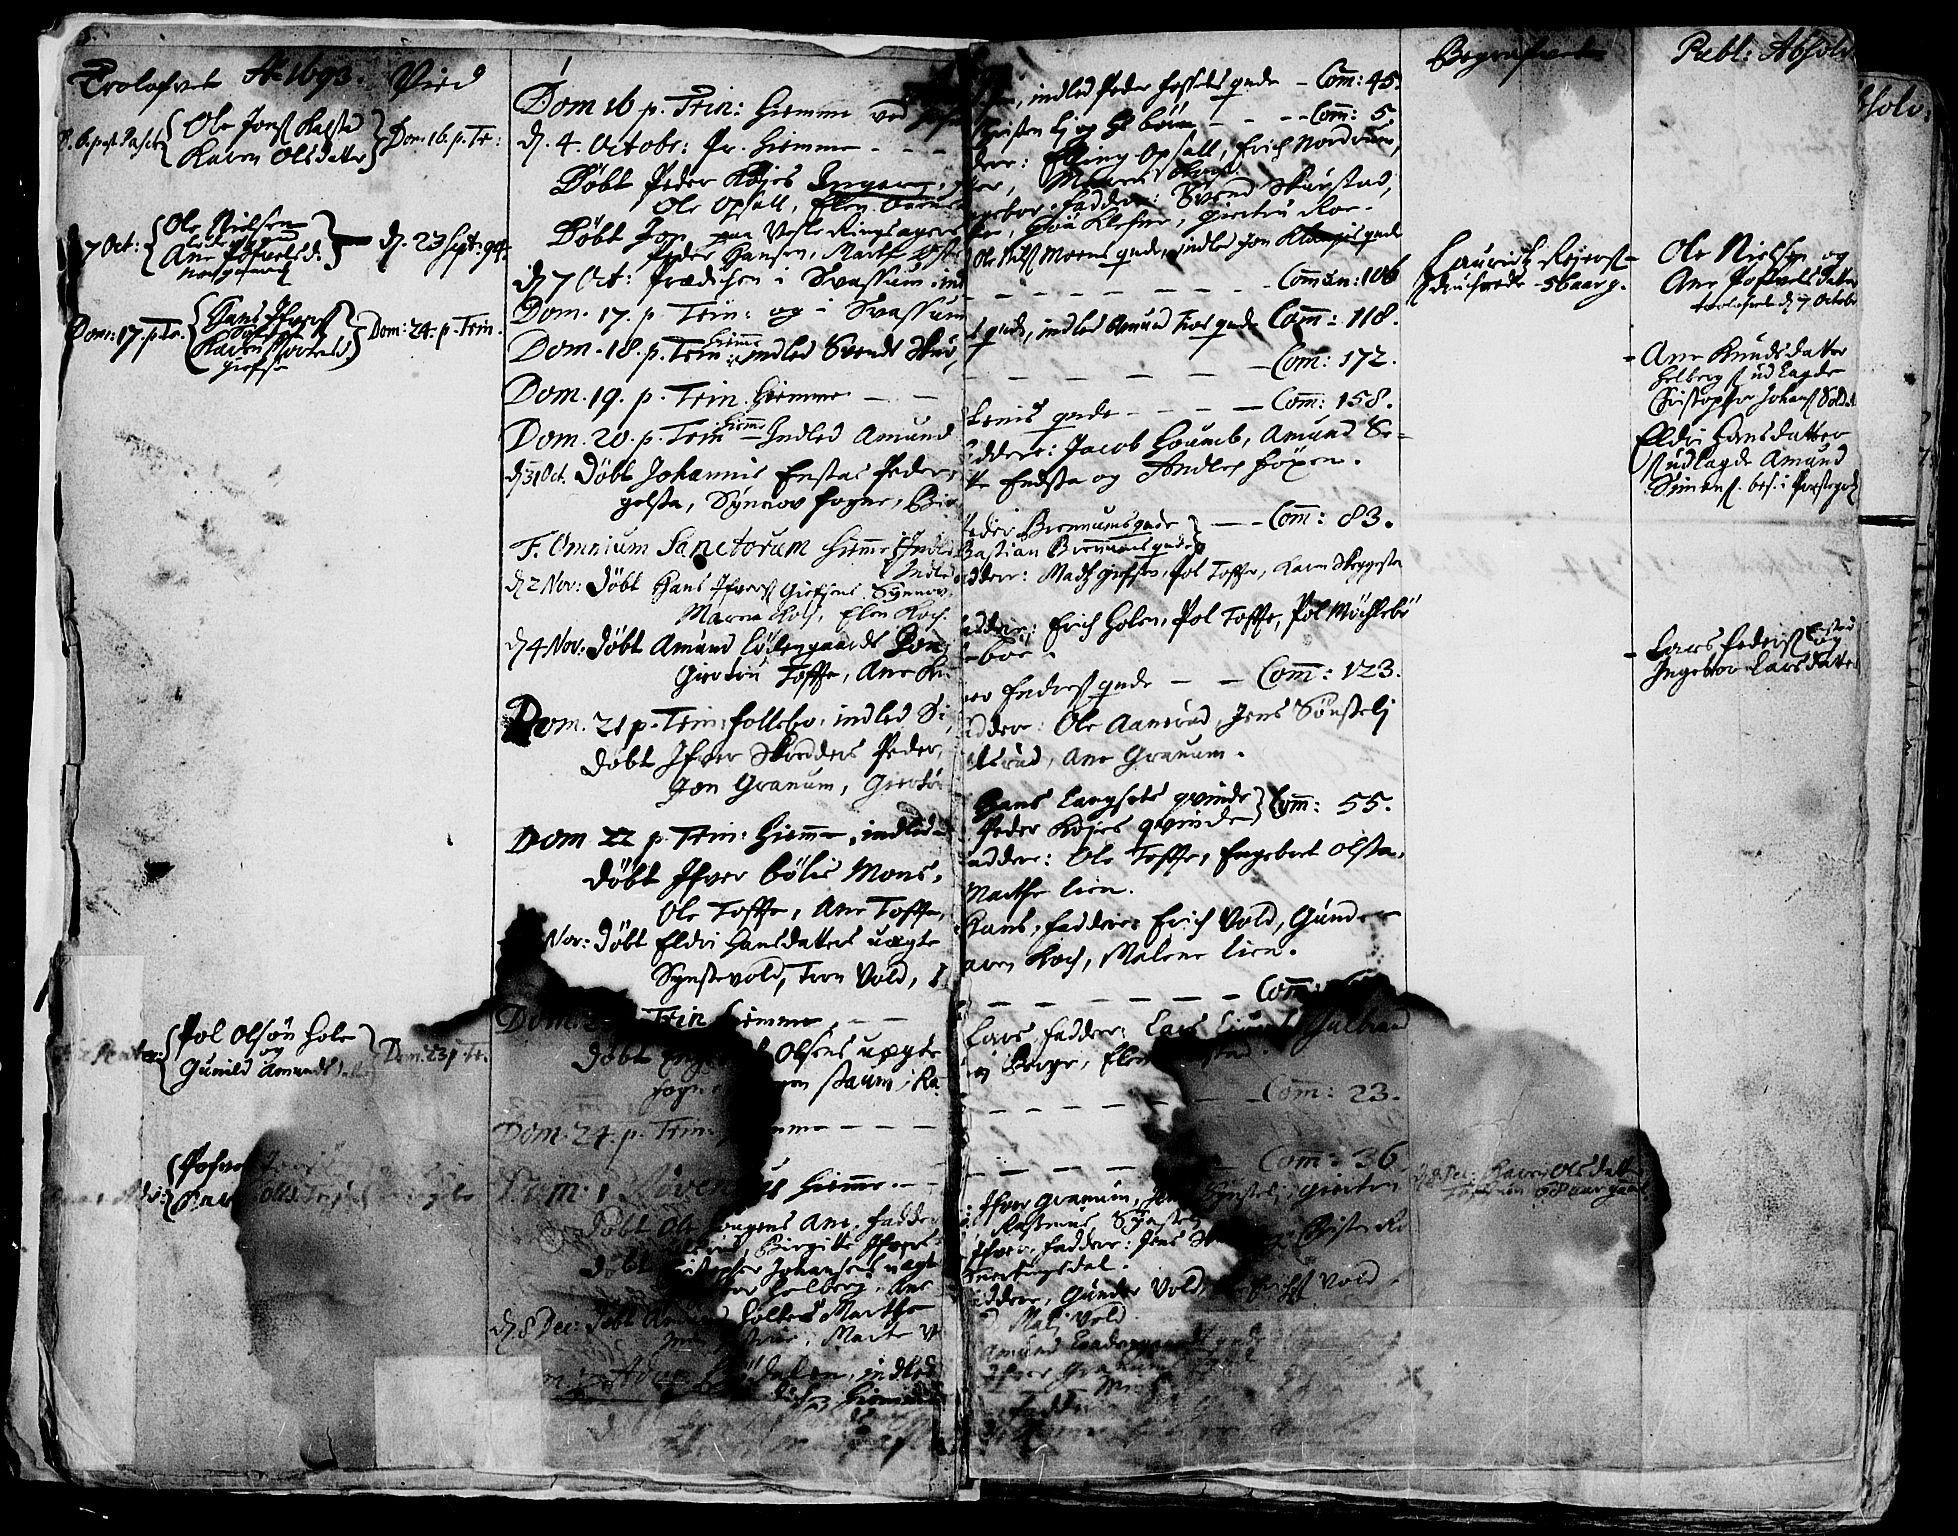 SAH, Gausdal prestekontor, Ministerialbok nr. 1, 1693-1728, s. 1